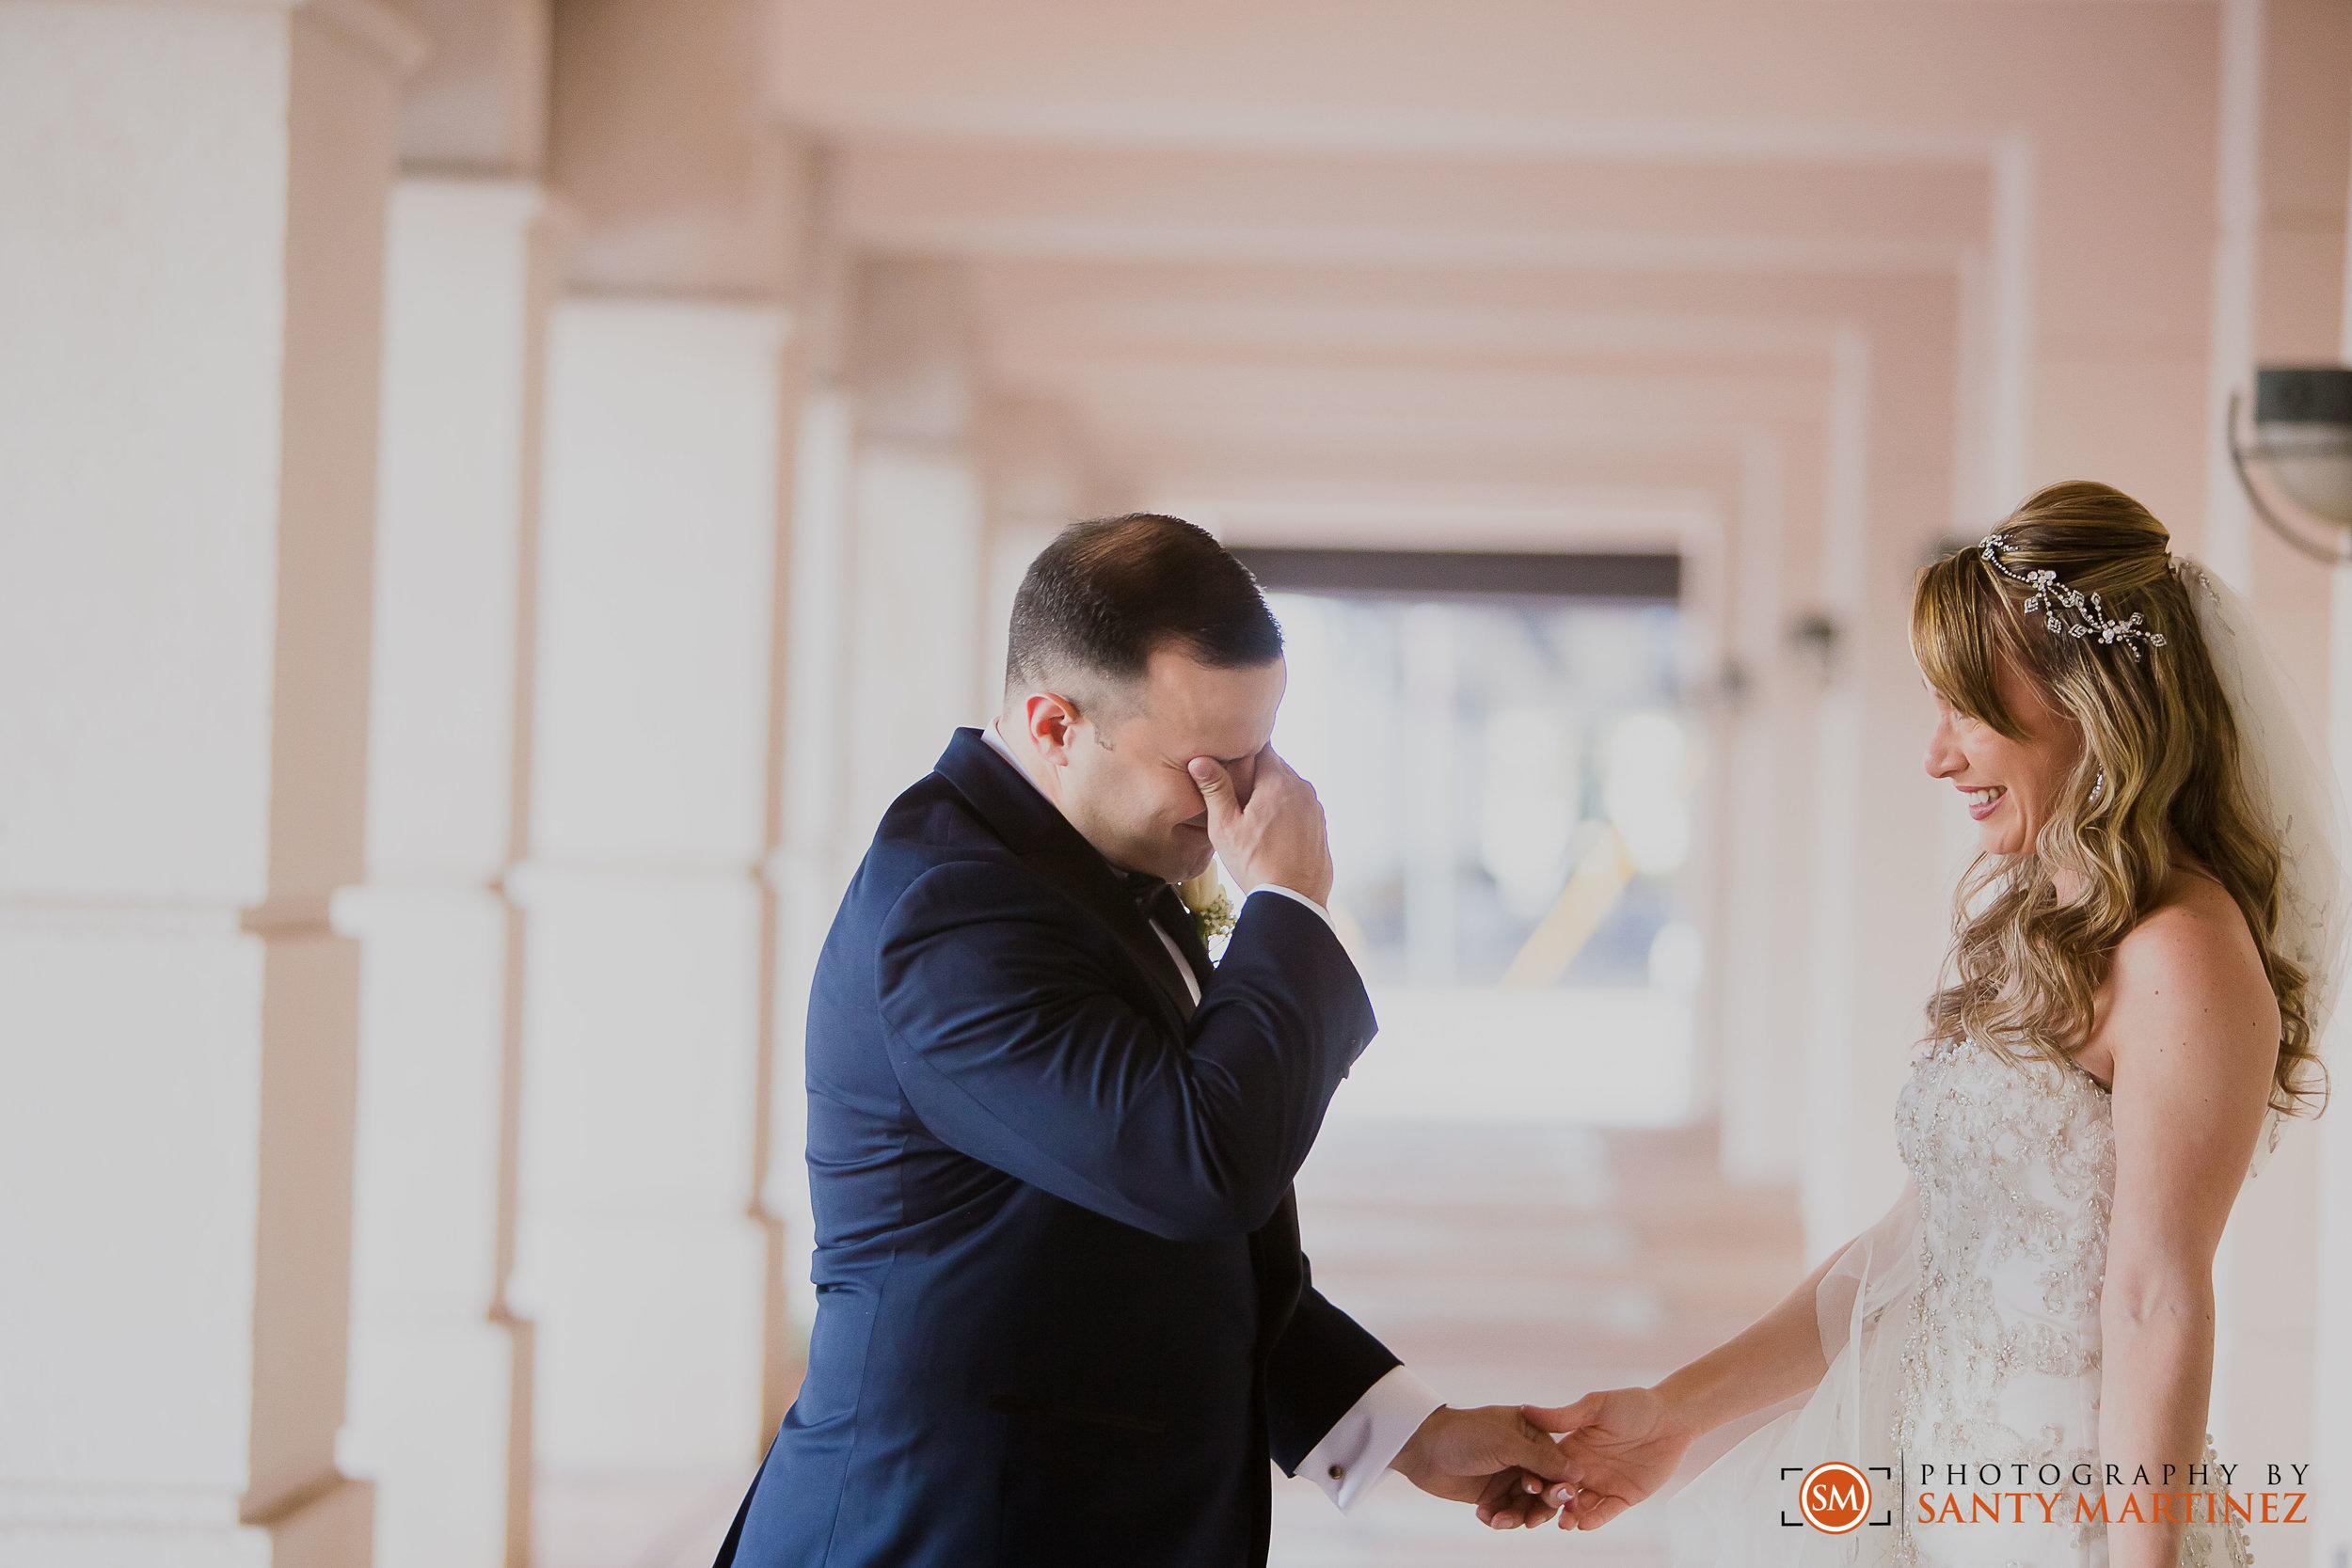 Wedding La Jolla Ballroom - Photography by Santy Martinez-16.jpg